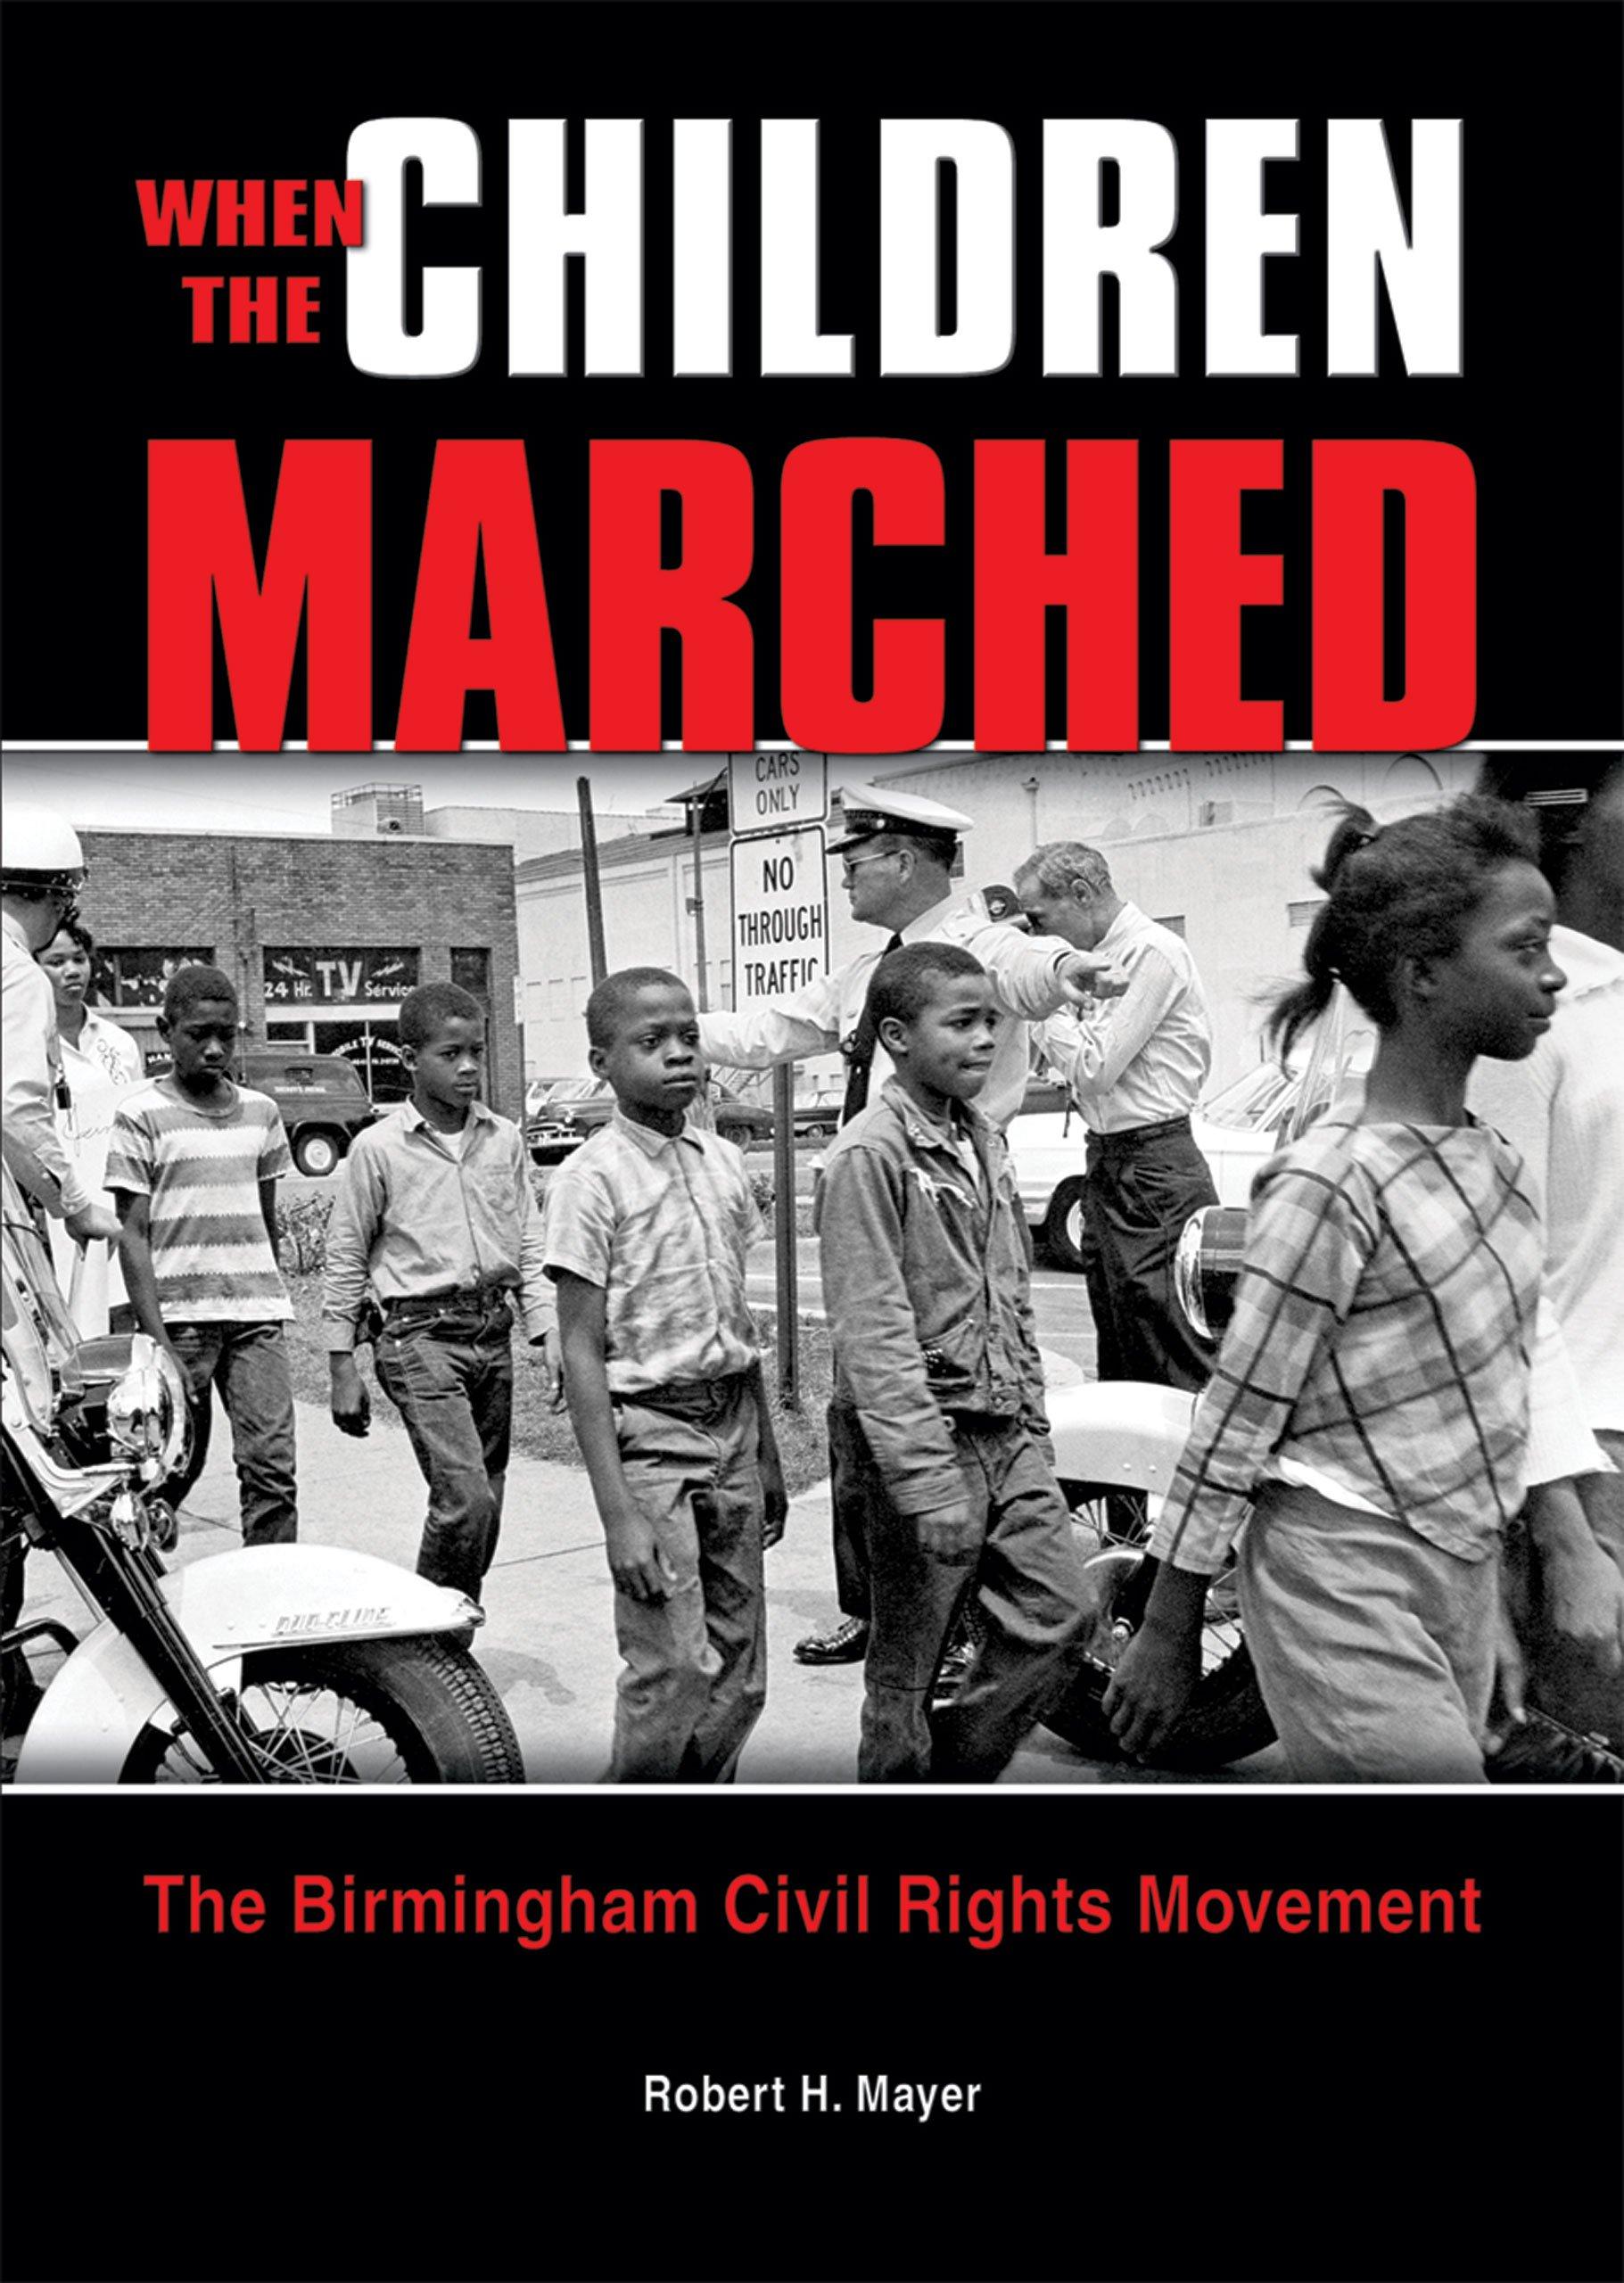 Read Online When the Children Marched: The Birmingham Civil Rights Movement (Prime) PDF